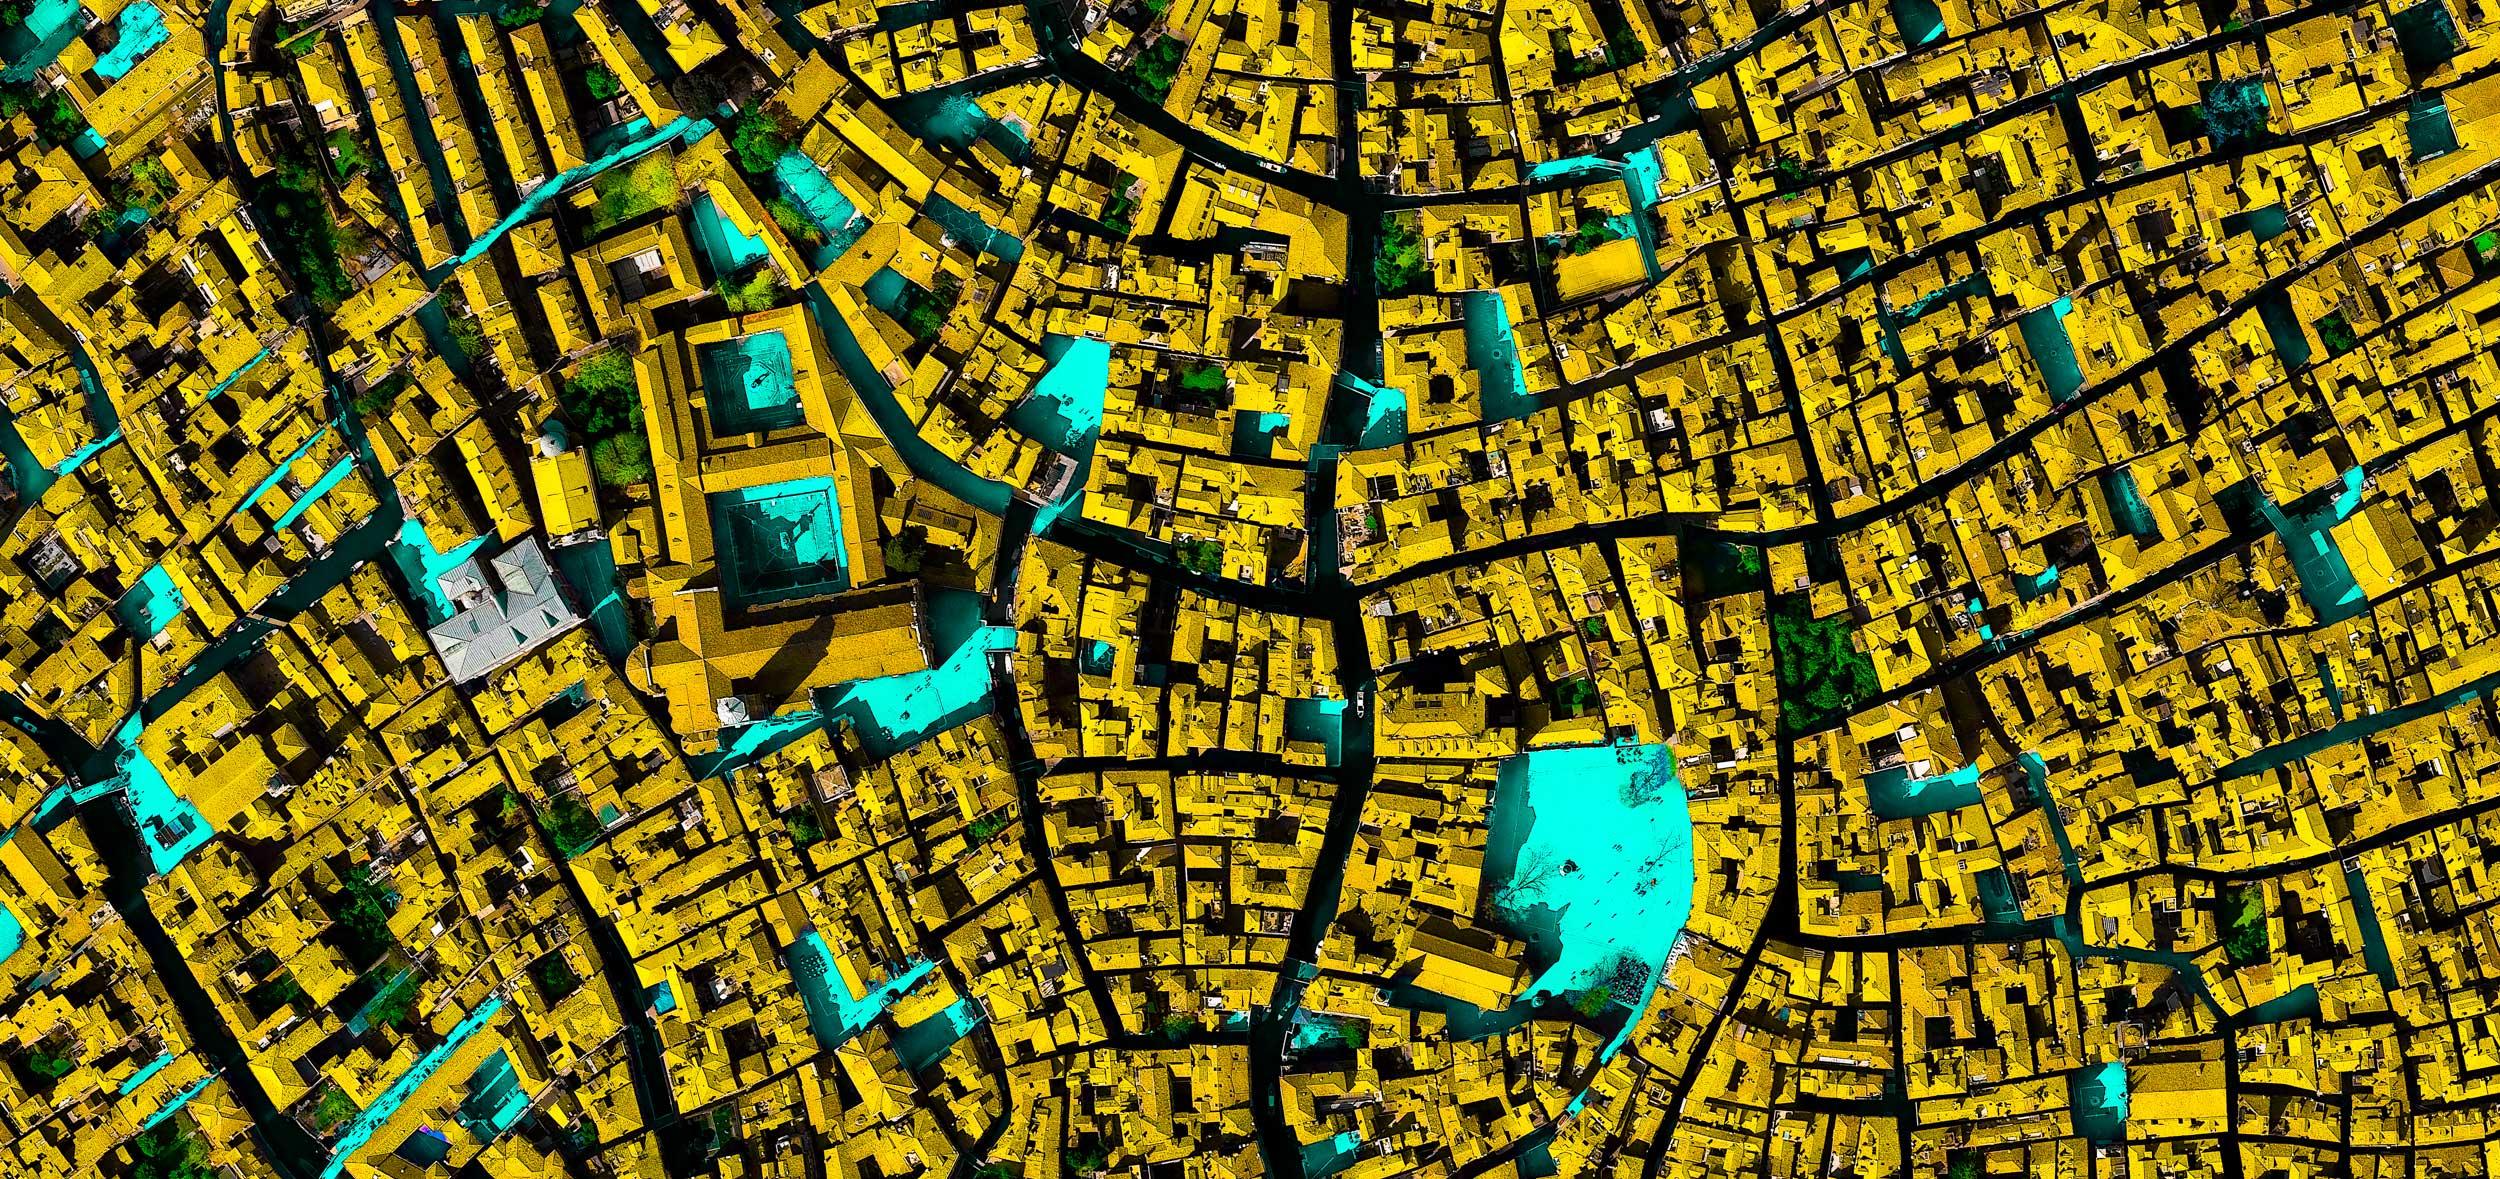 Venice-III ULTRADISTANCIA ©Federico WIner.jpg